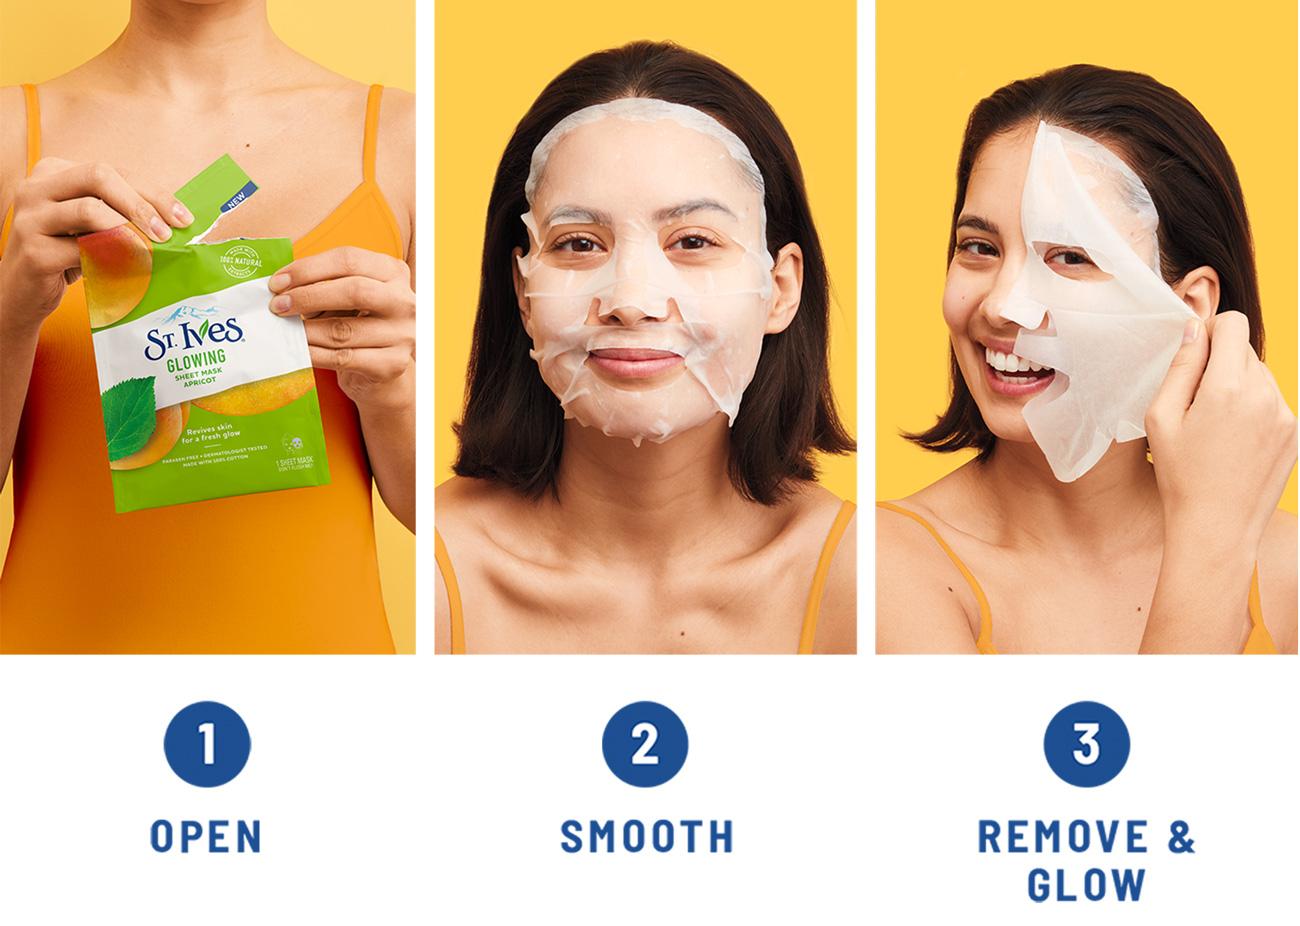 St Ives Modo De Uso Glowing Mask Apricot